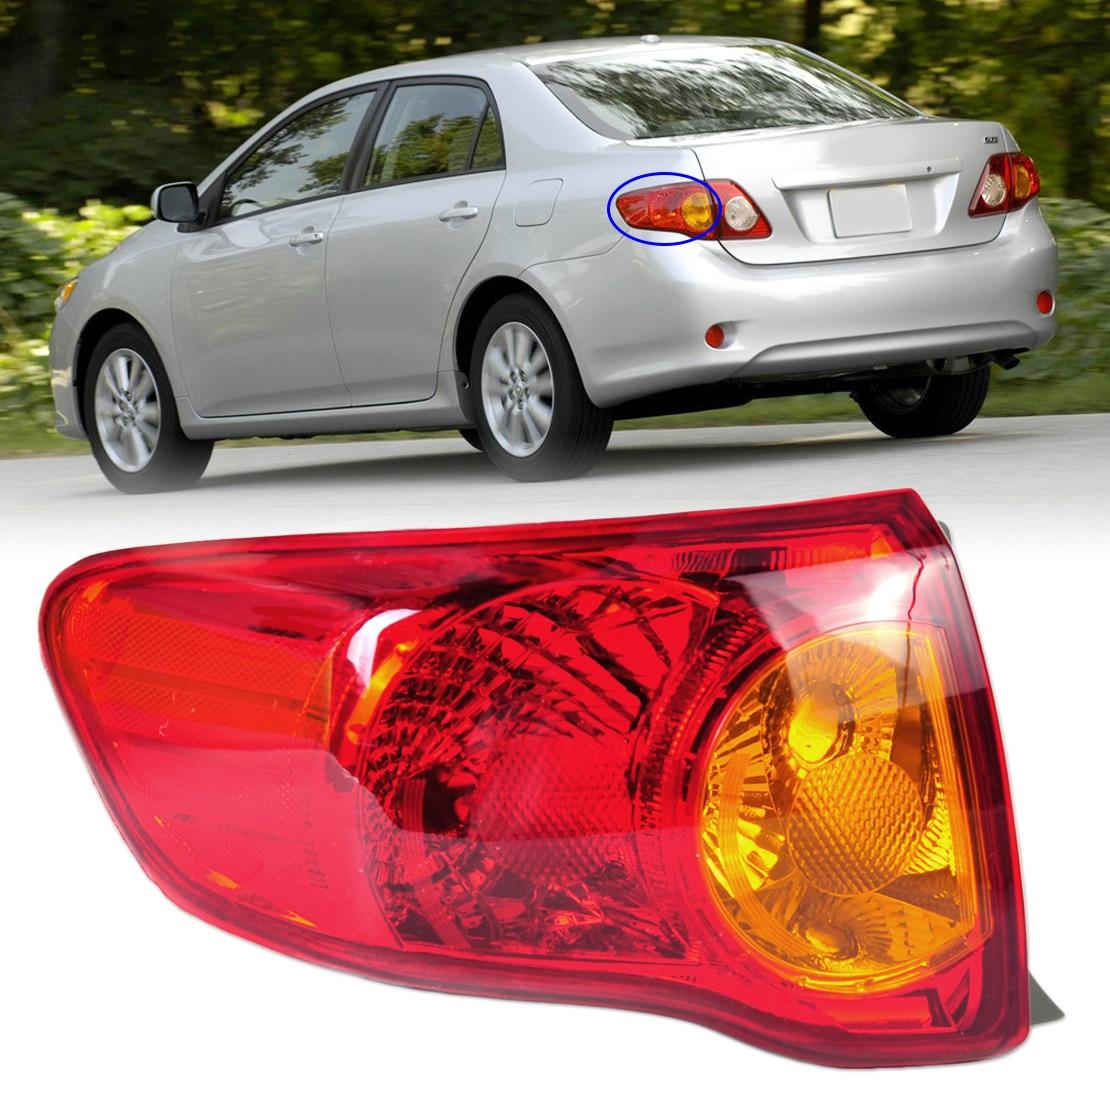 DWCX TO2800175 166-50863L Rear Left Outer Tail Light Taillight Hoods Brake Light for Toyota Corolla 2009 2010 left hand drive for vw passat b6 2006 2007 2008 2009 2010 2011 led rear tail light lamp left side outer left hand trafic only 3c5945095f